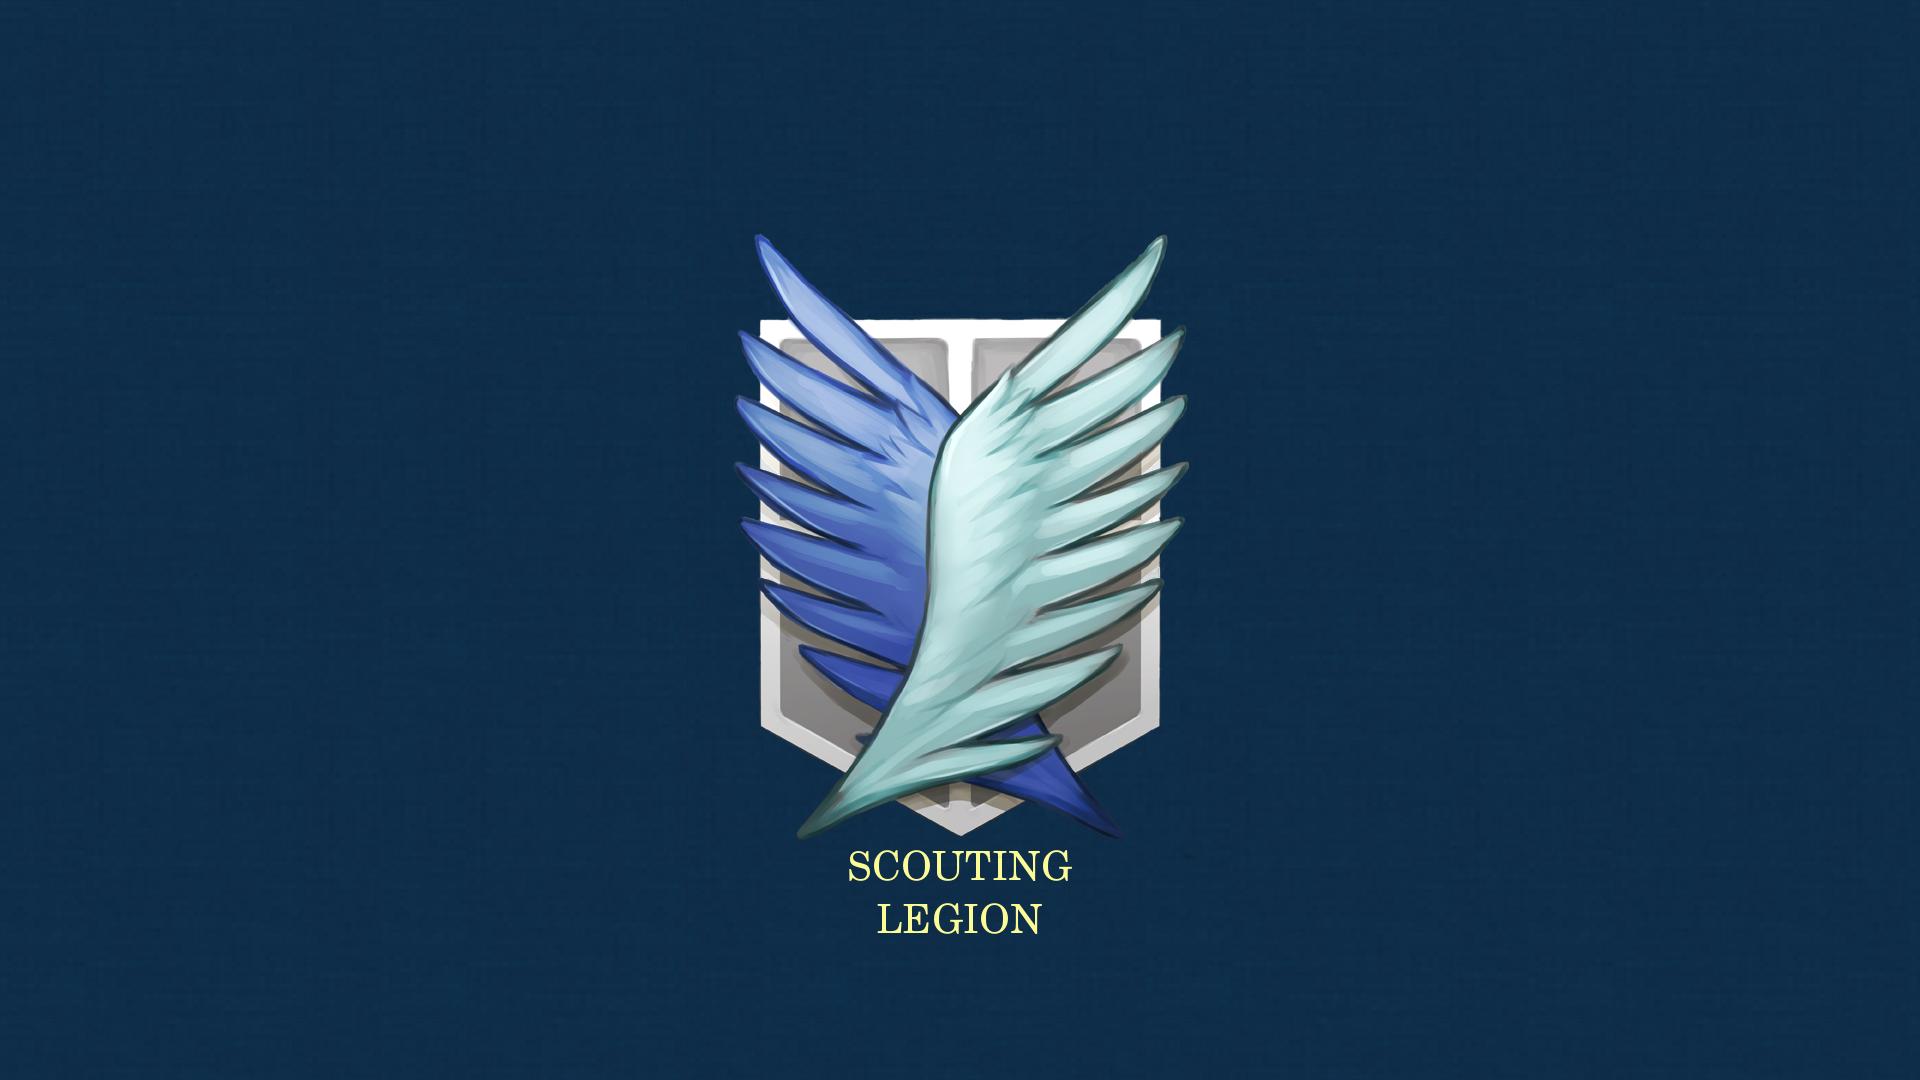 Attack On Titan Scouting Legion Wallpaper Redux By Imxset21 On Deviantart